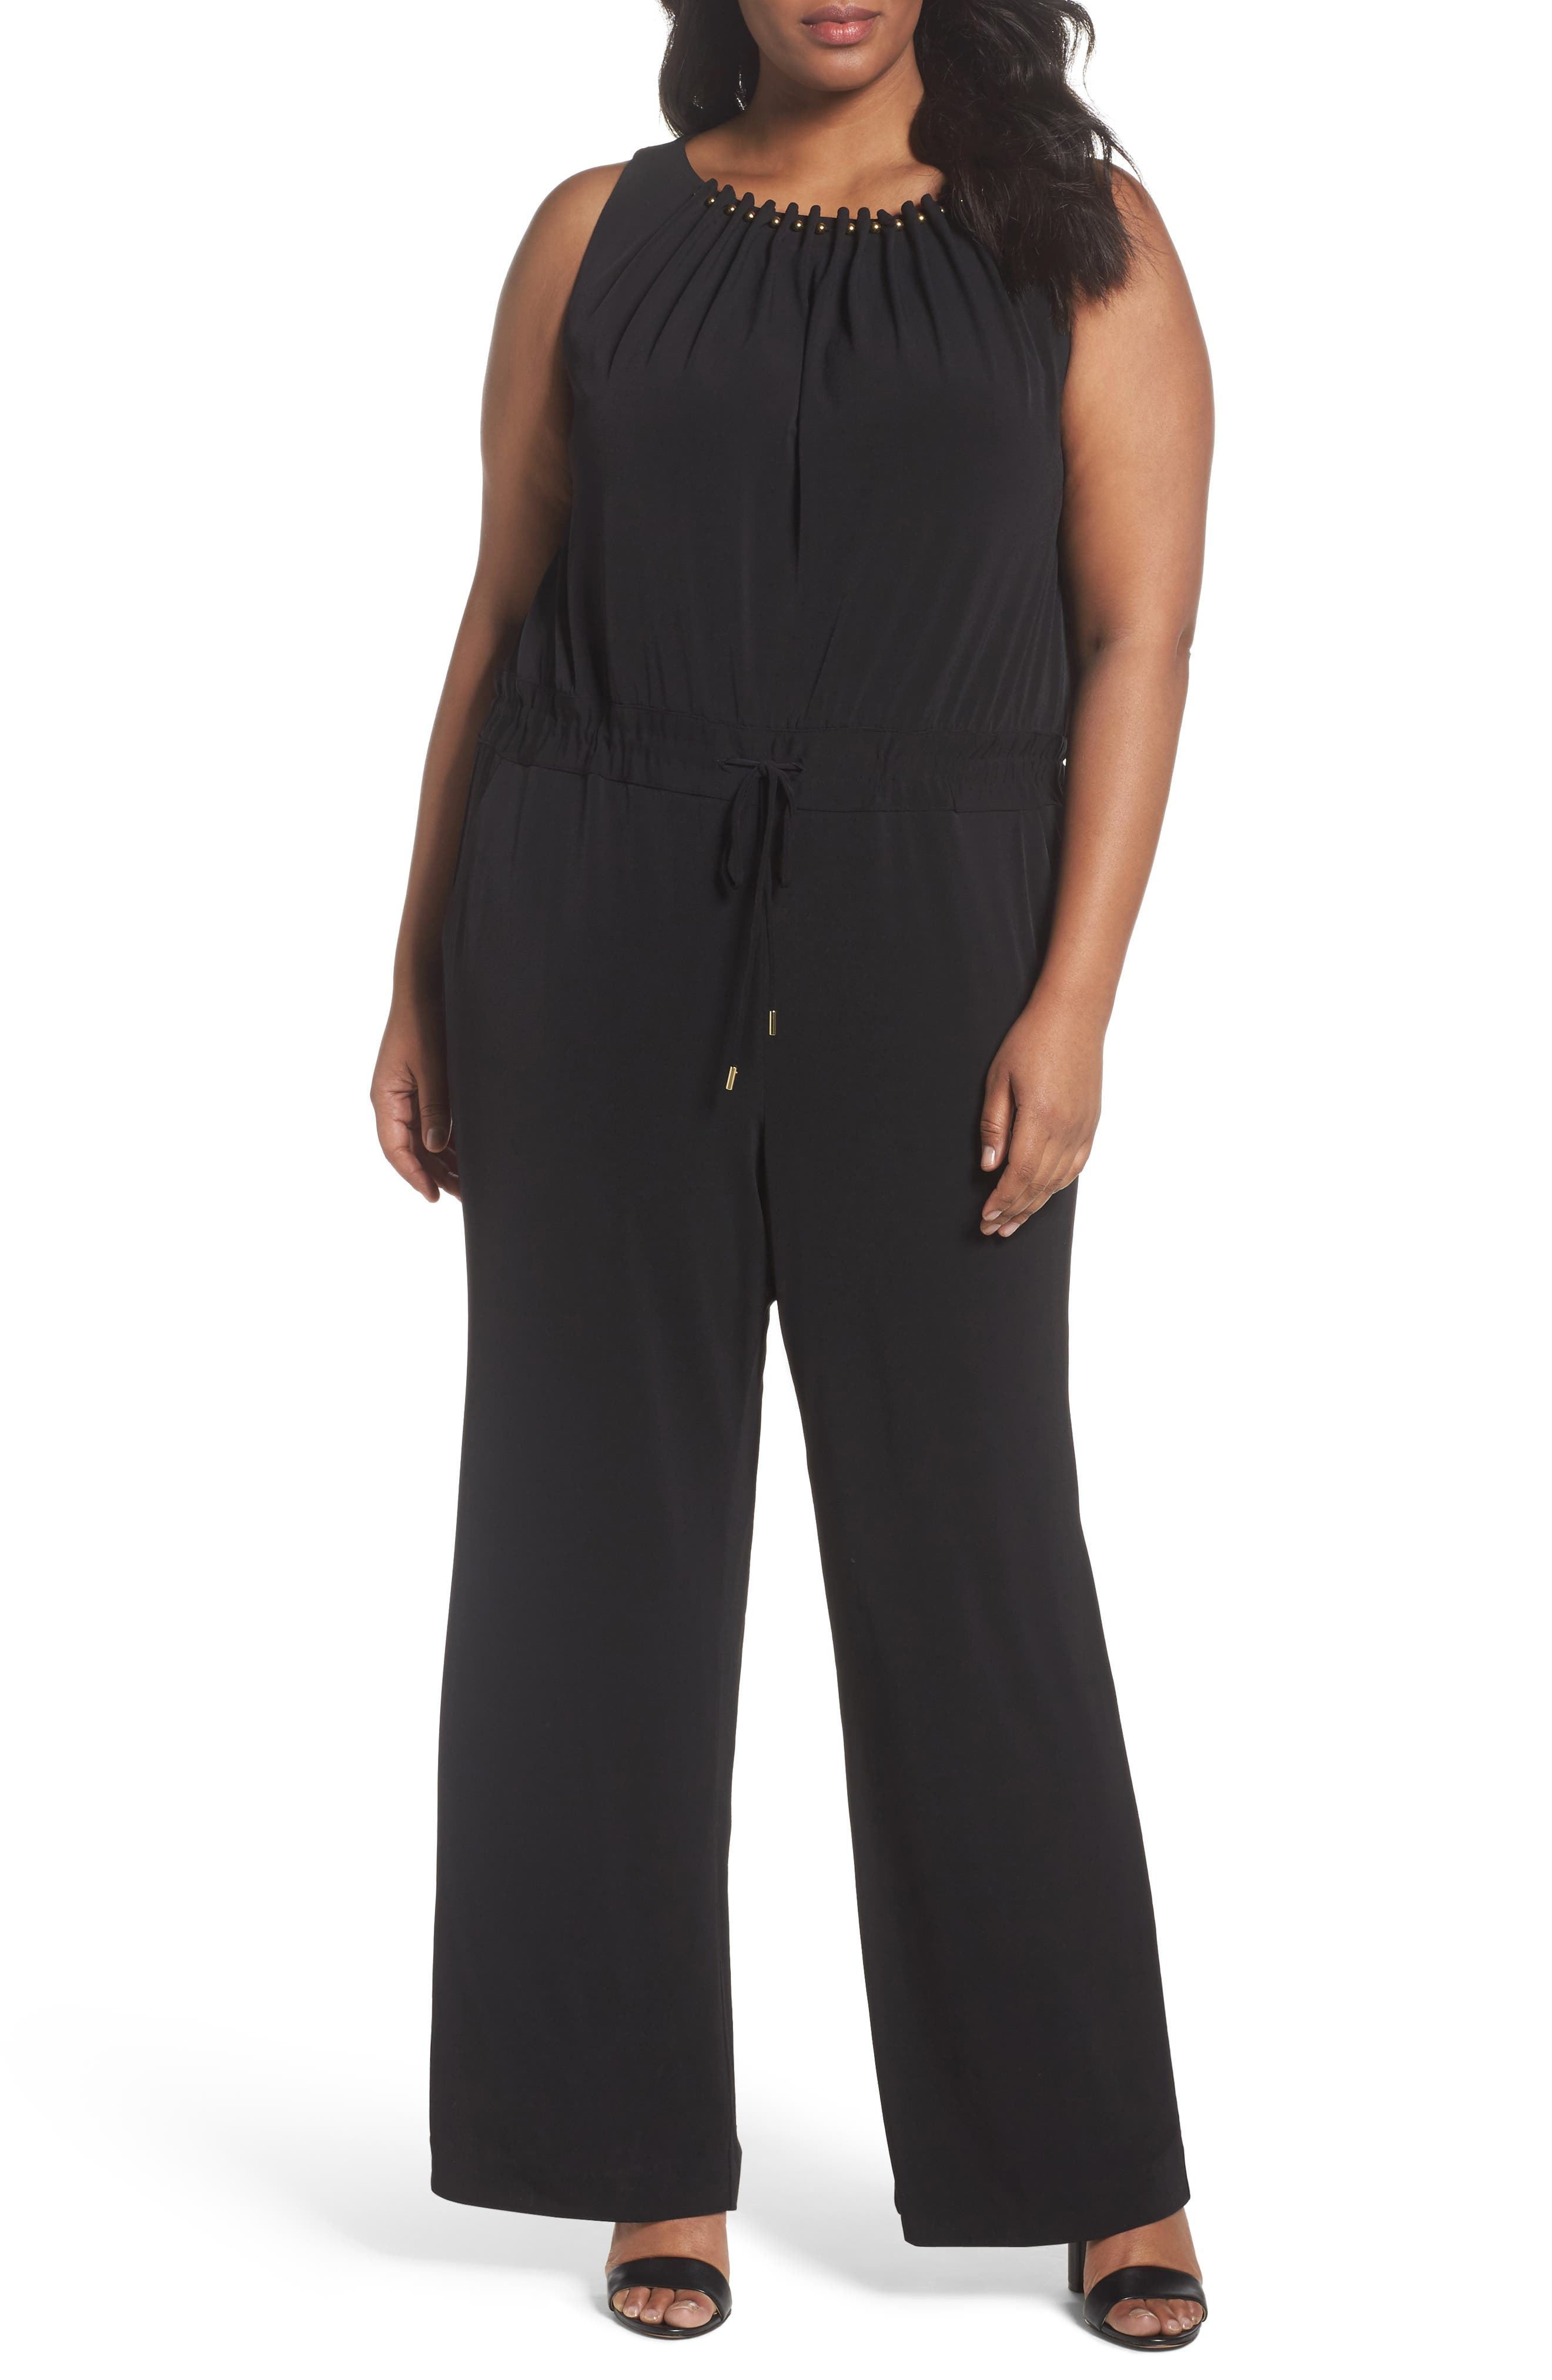 Tahari Embellished Jersey Jumpsuit (Plus Size)